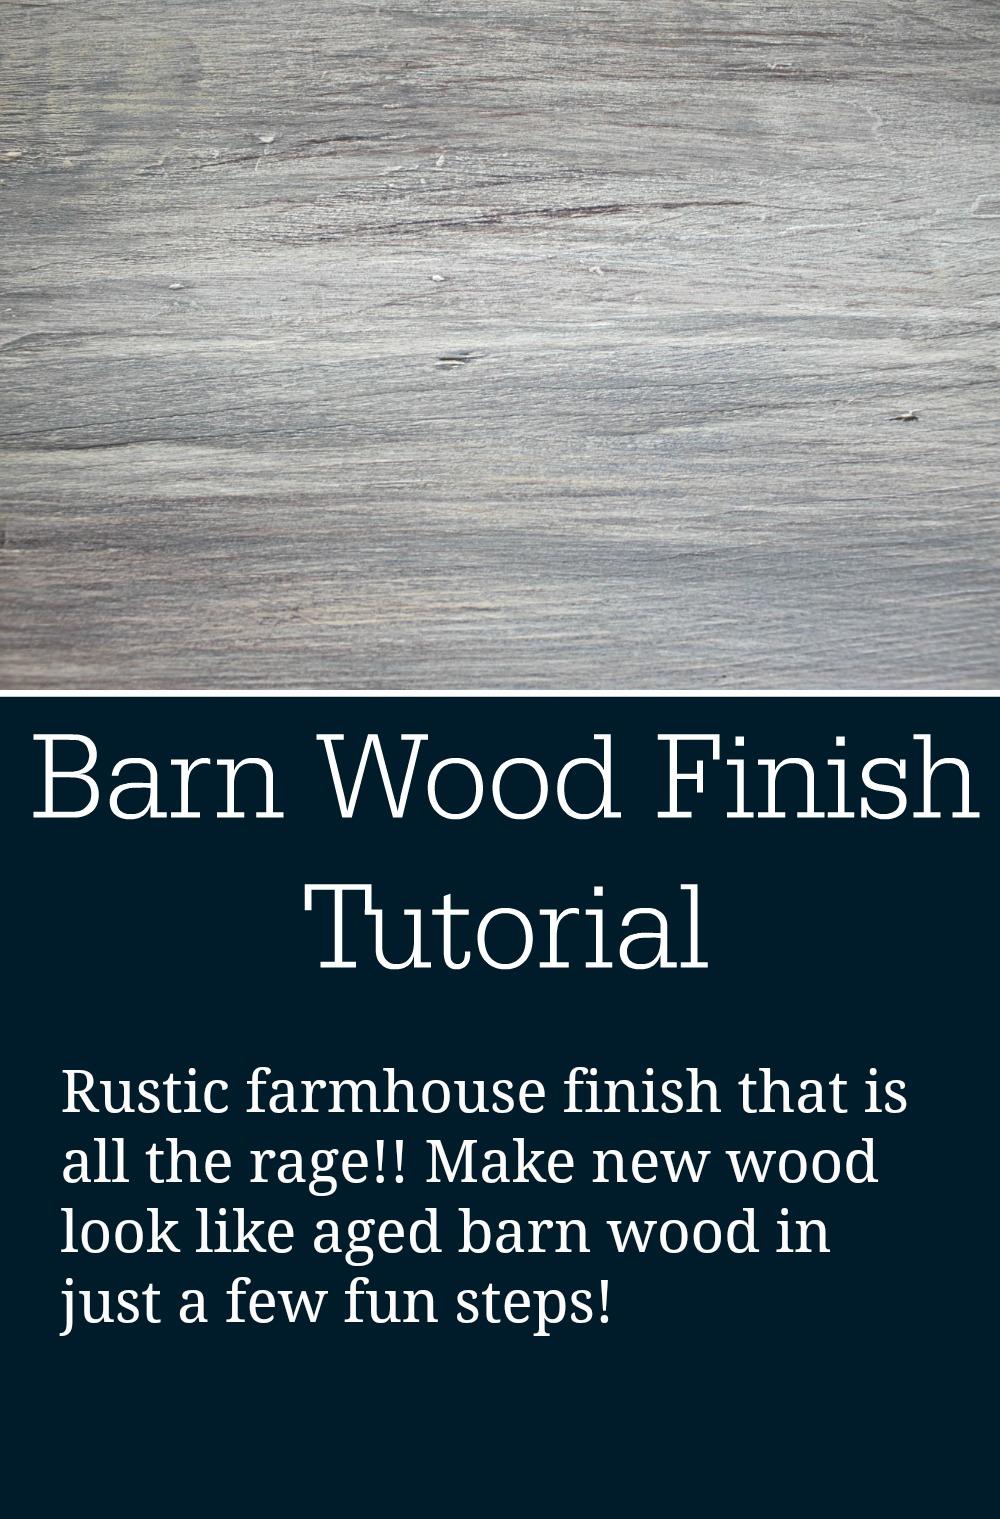 barnwood class title.jpg